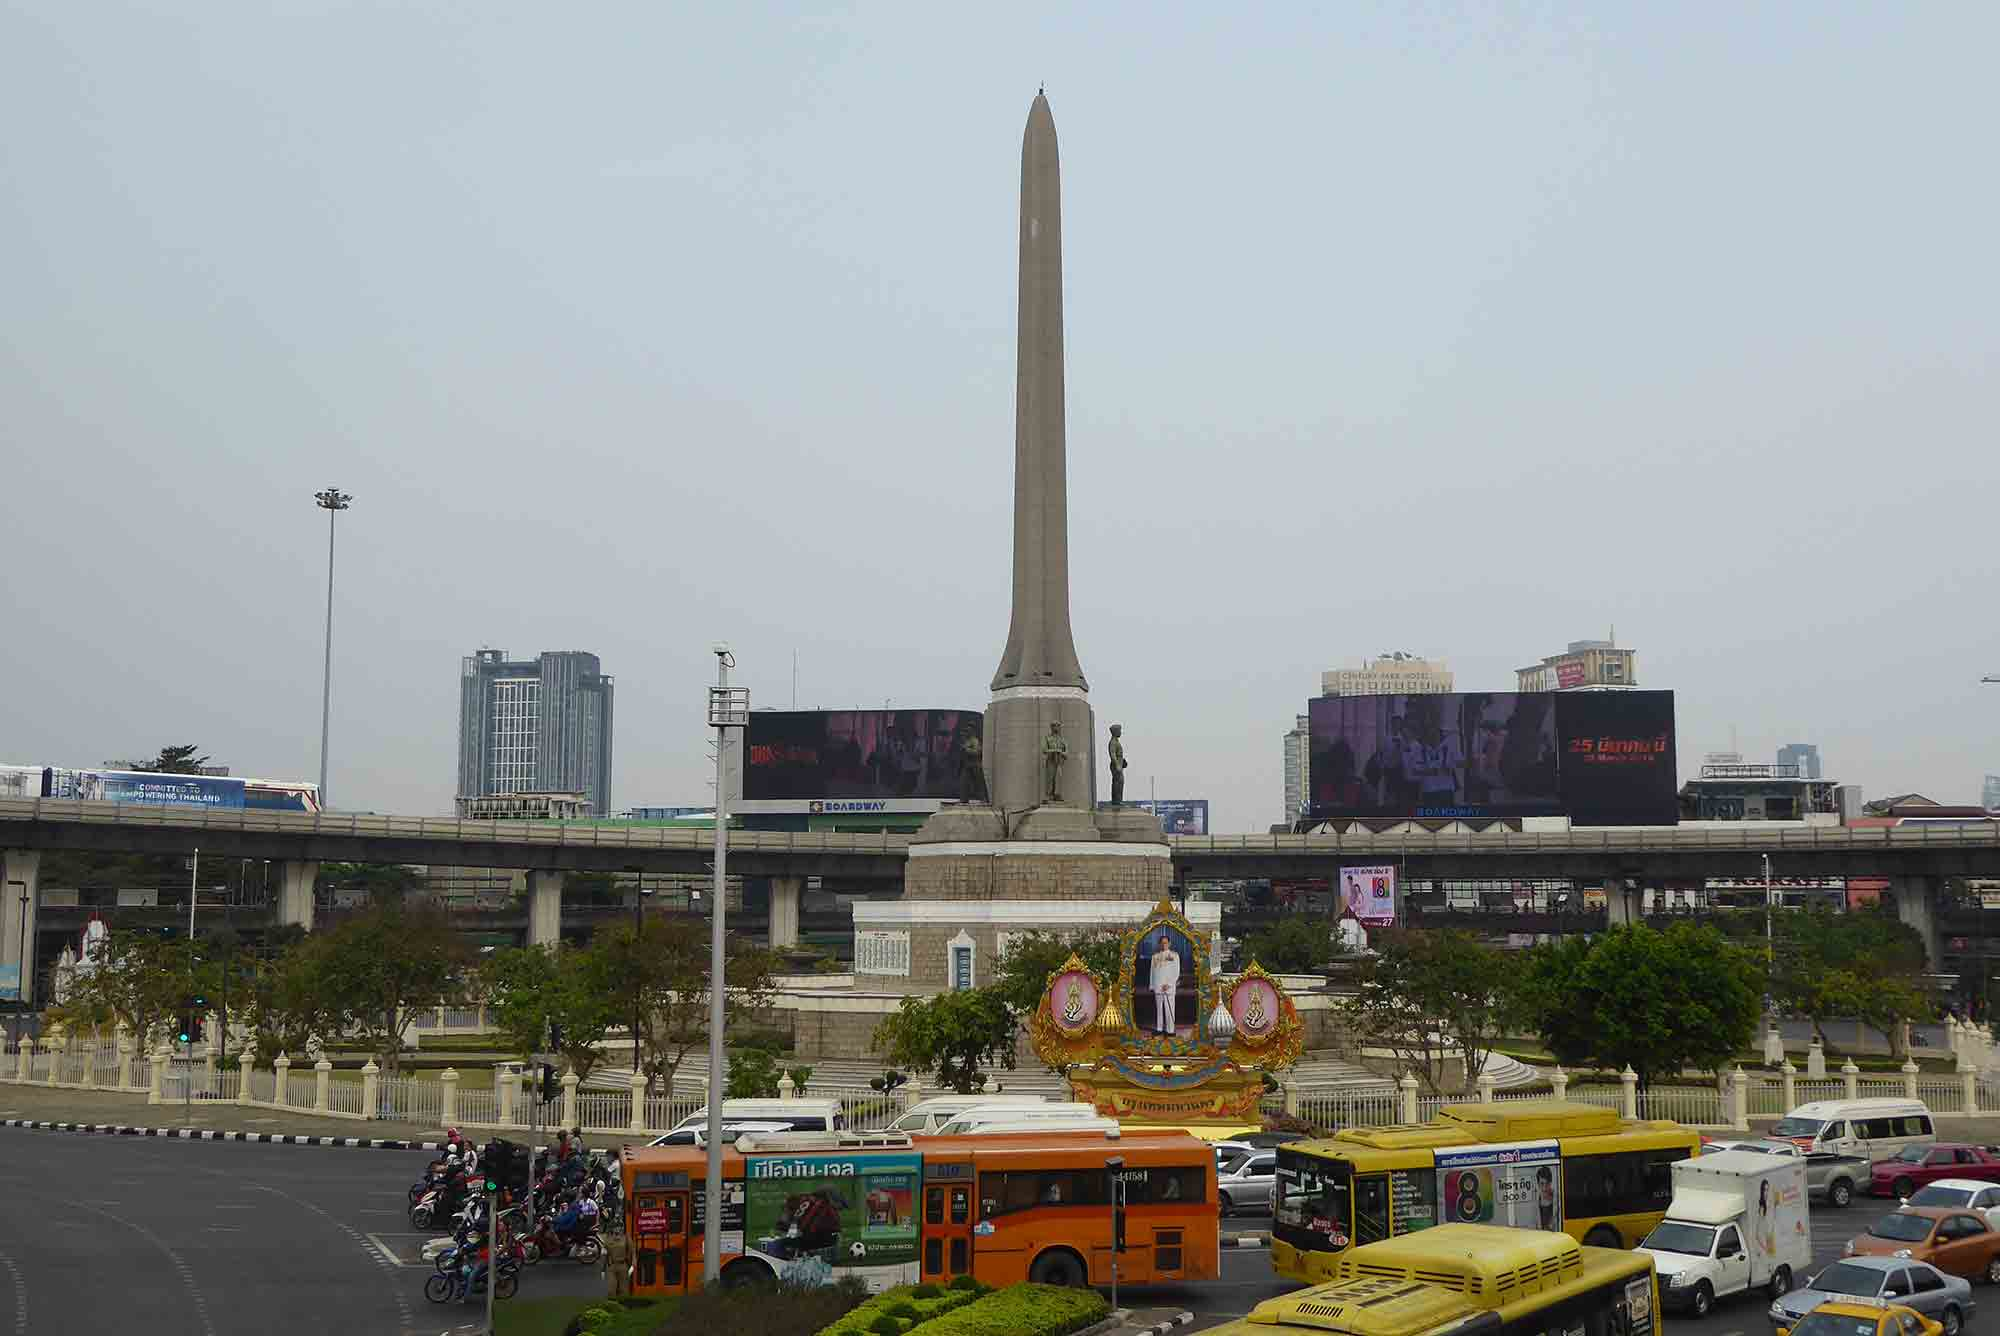 P1110157 - Landmarks & Monuments